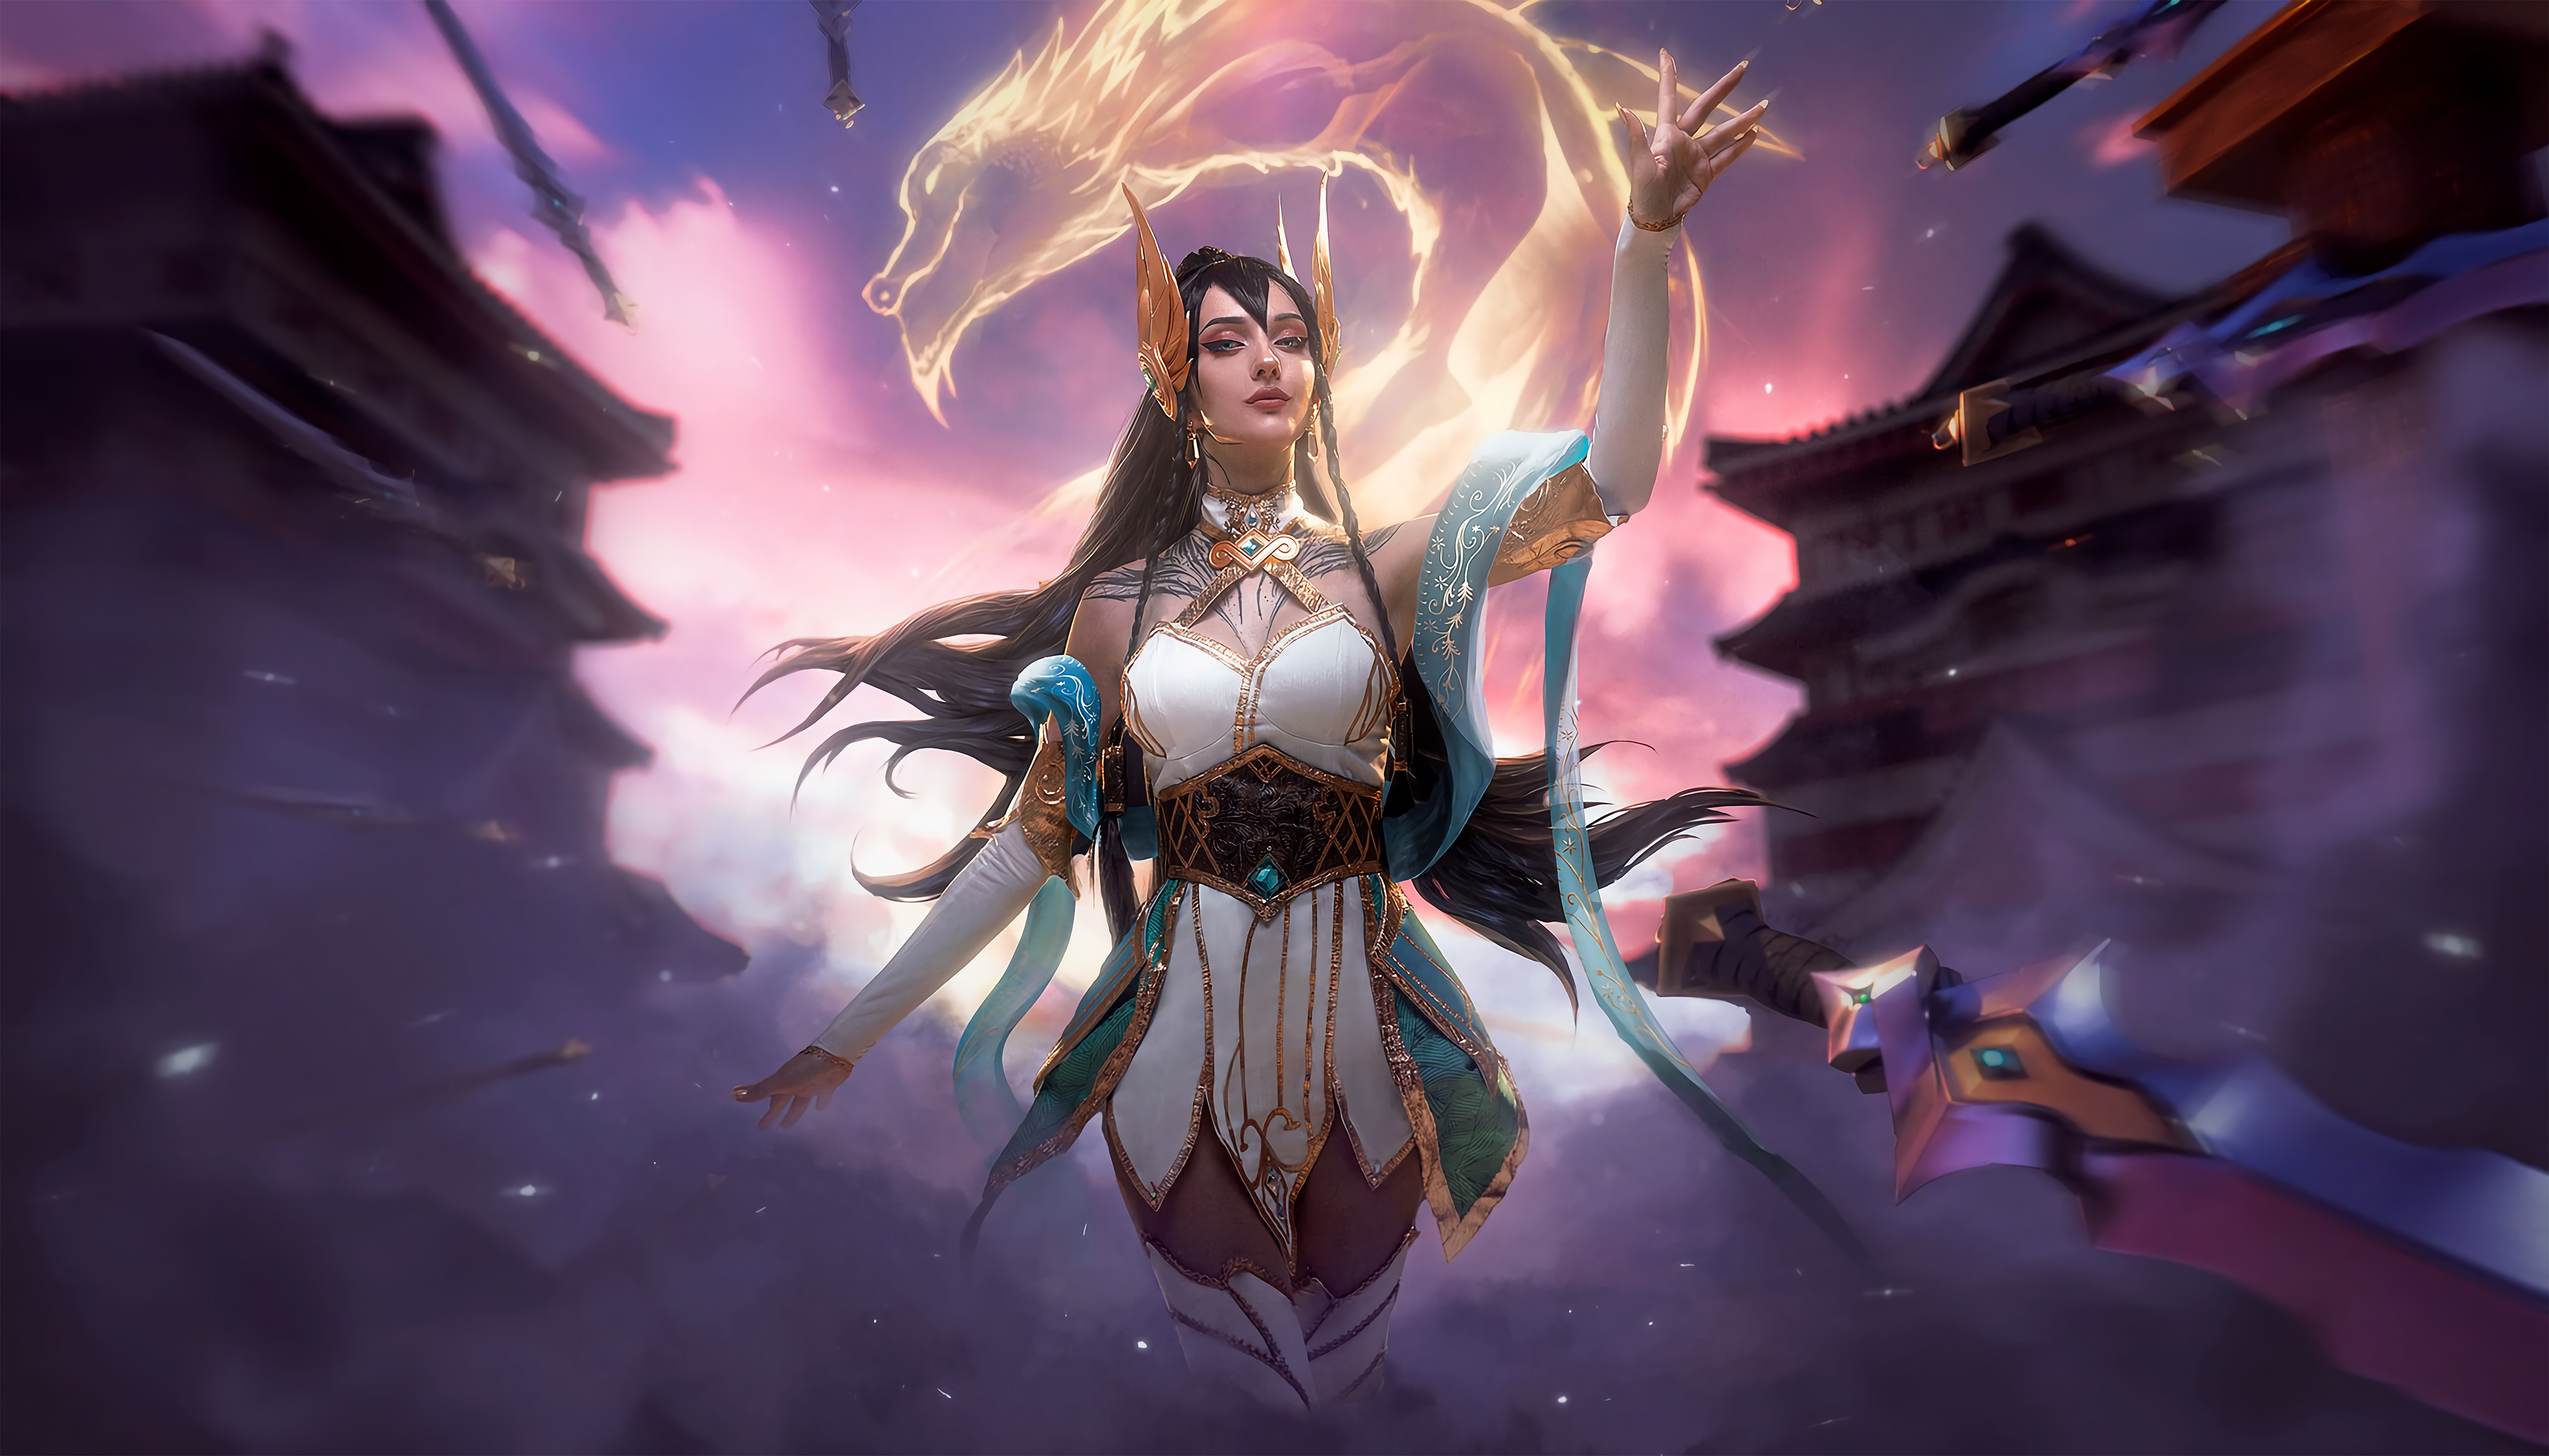 Fondos de pantalla Irelia League of Legends Arte Digital